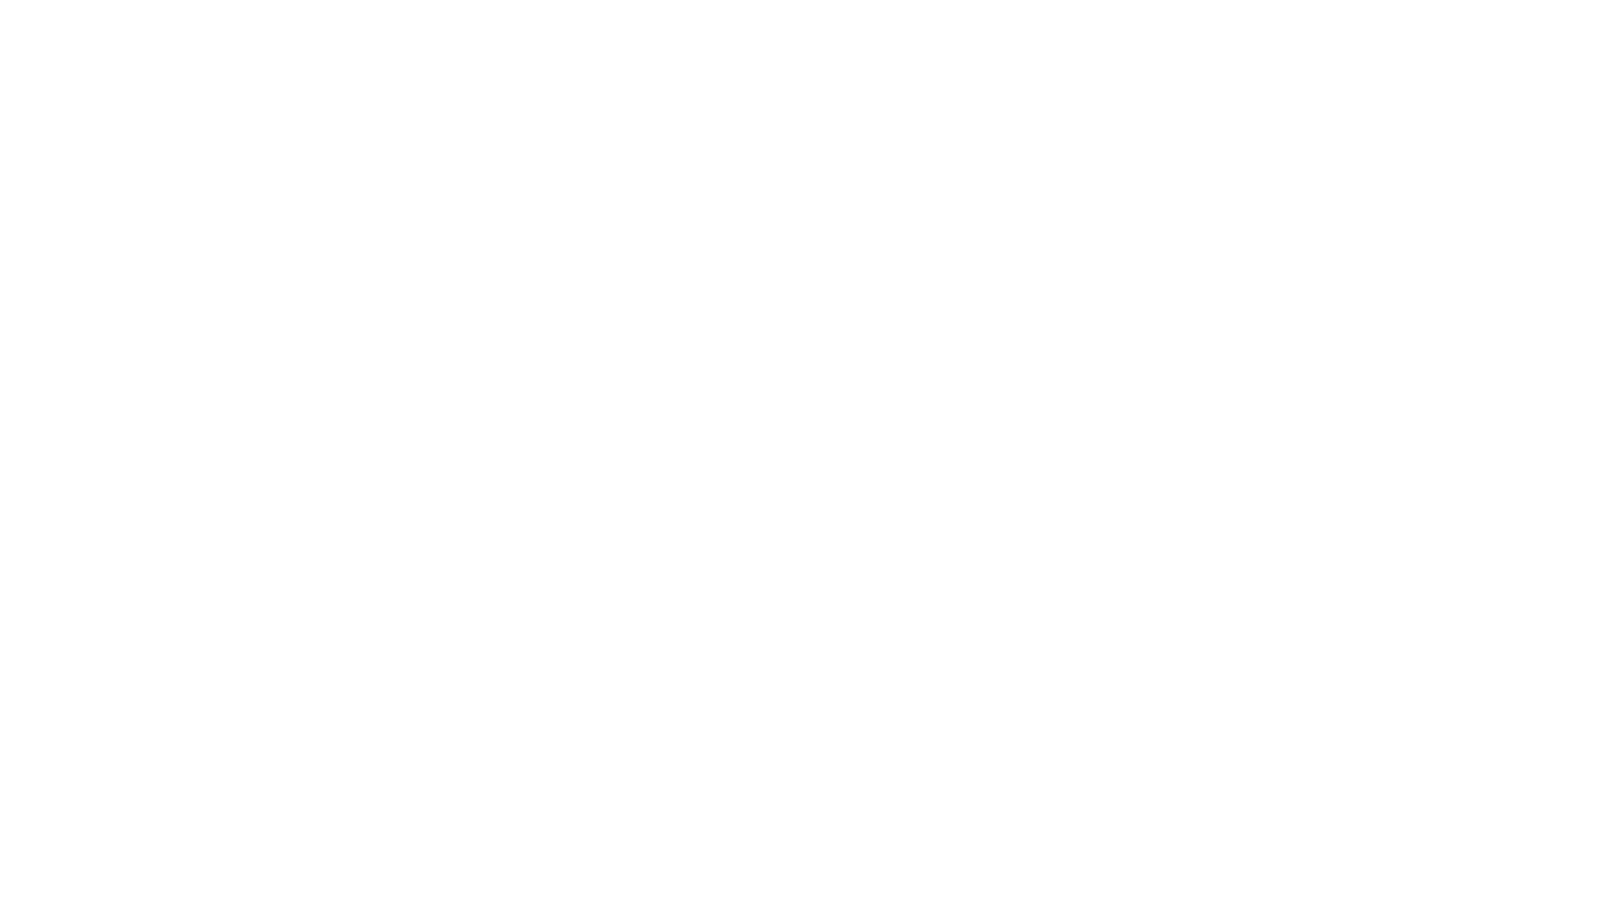 Preacher -  Huw Willis huw@hoylakeevangelical.org.uk  Church Copyright Licence - 303452 Church Video Licence - 1146632 PRS for Music Church Licence - 1149639 Streaming License - 44235  #Hoylake #Meols #WestKirby #Wirral #HoylakeEvangelicalChurch #Resurrection #BiblePreaching #Gospel #Jesus #Sermon